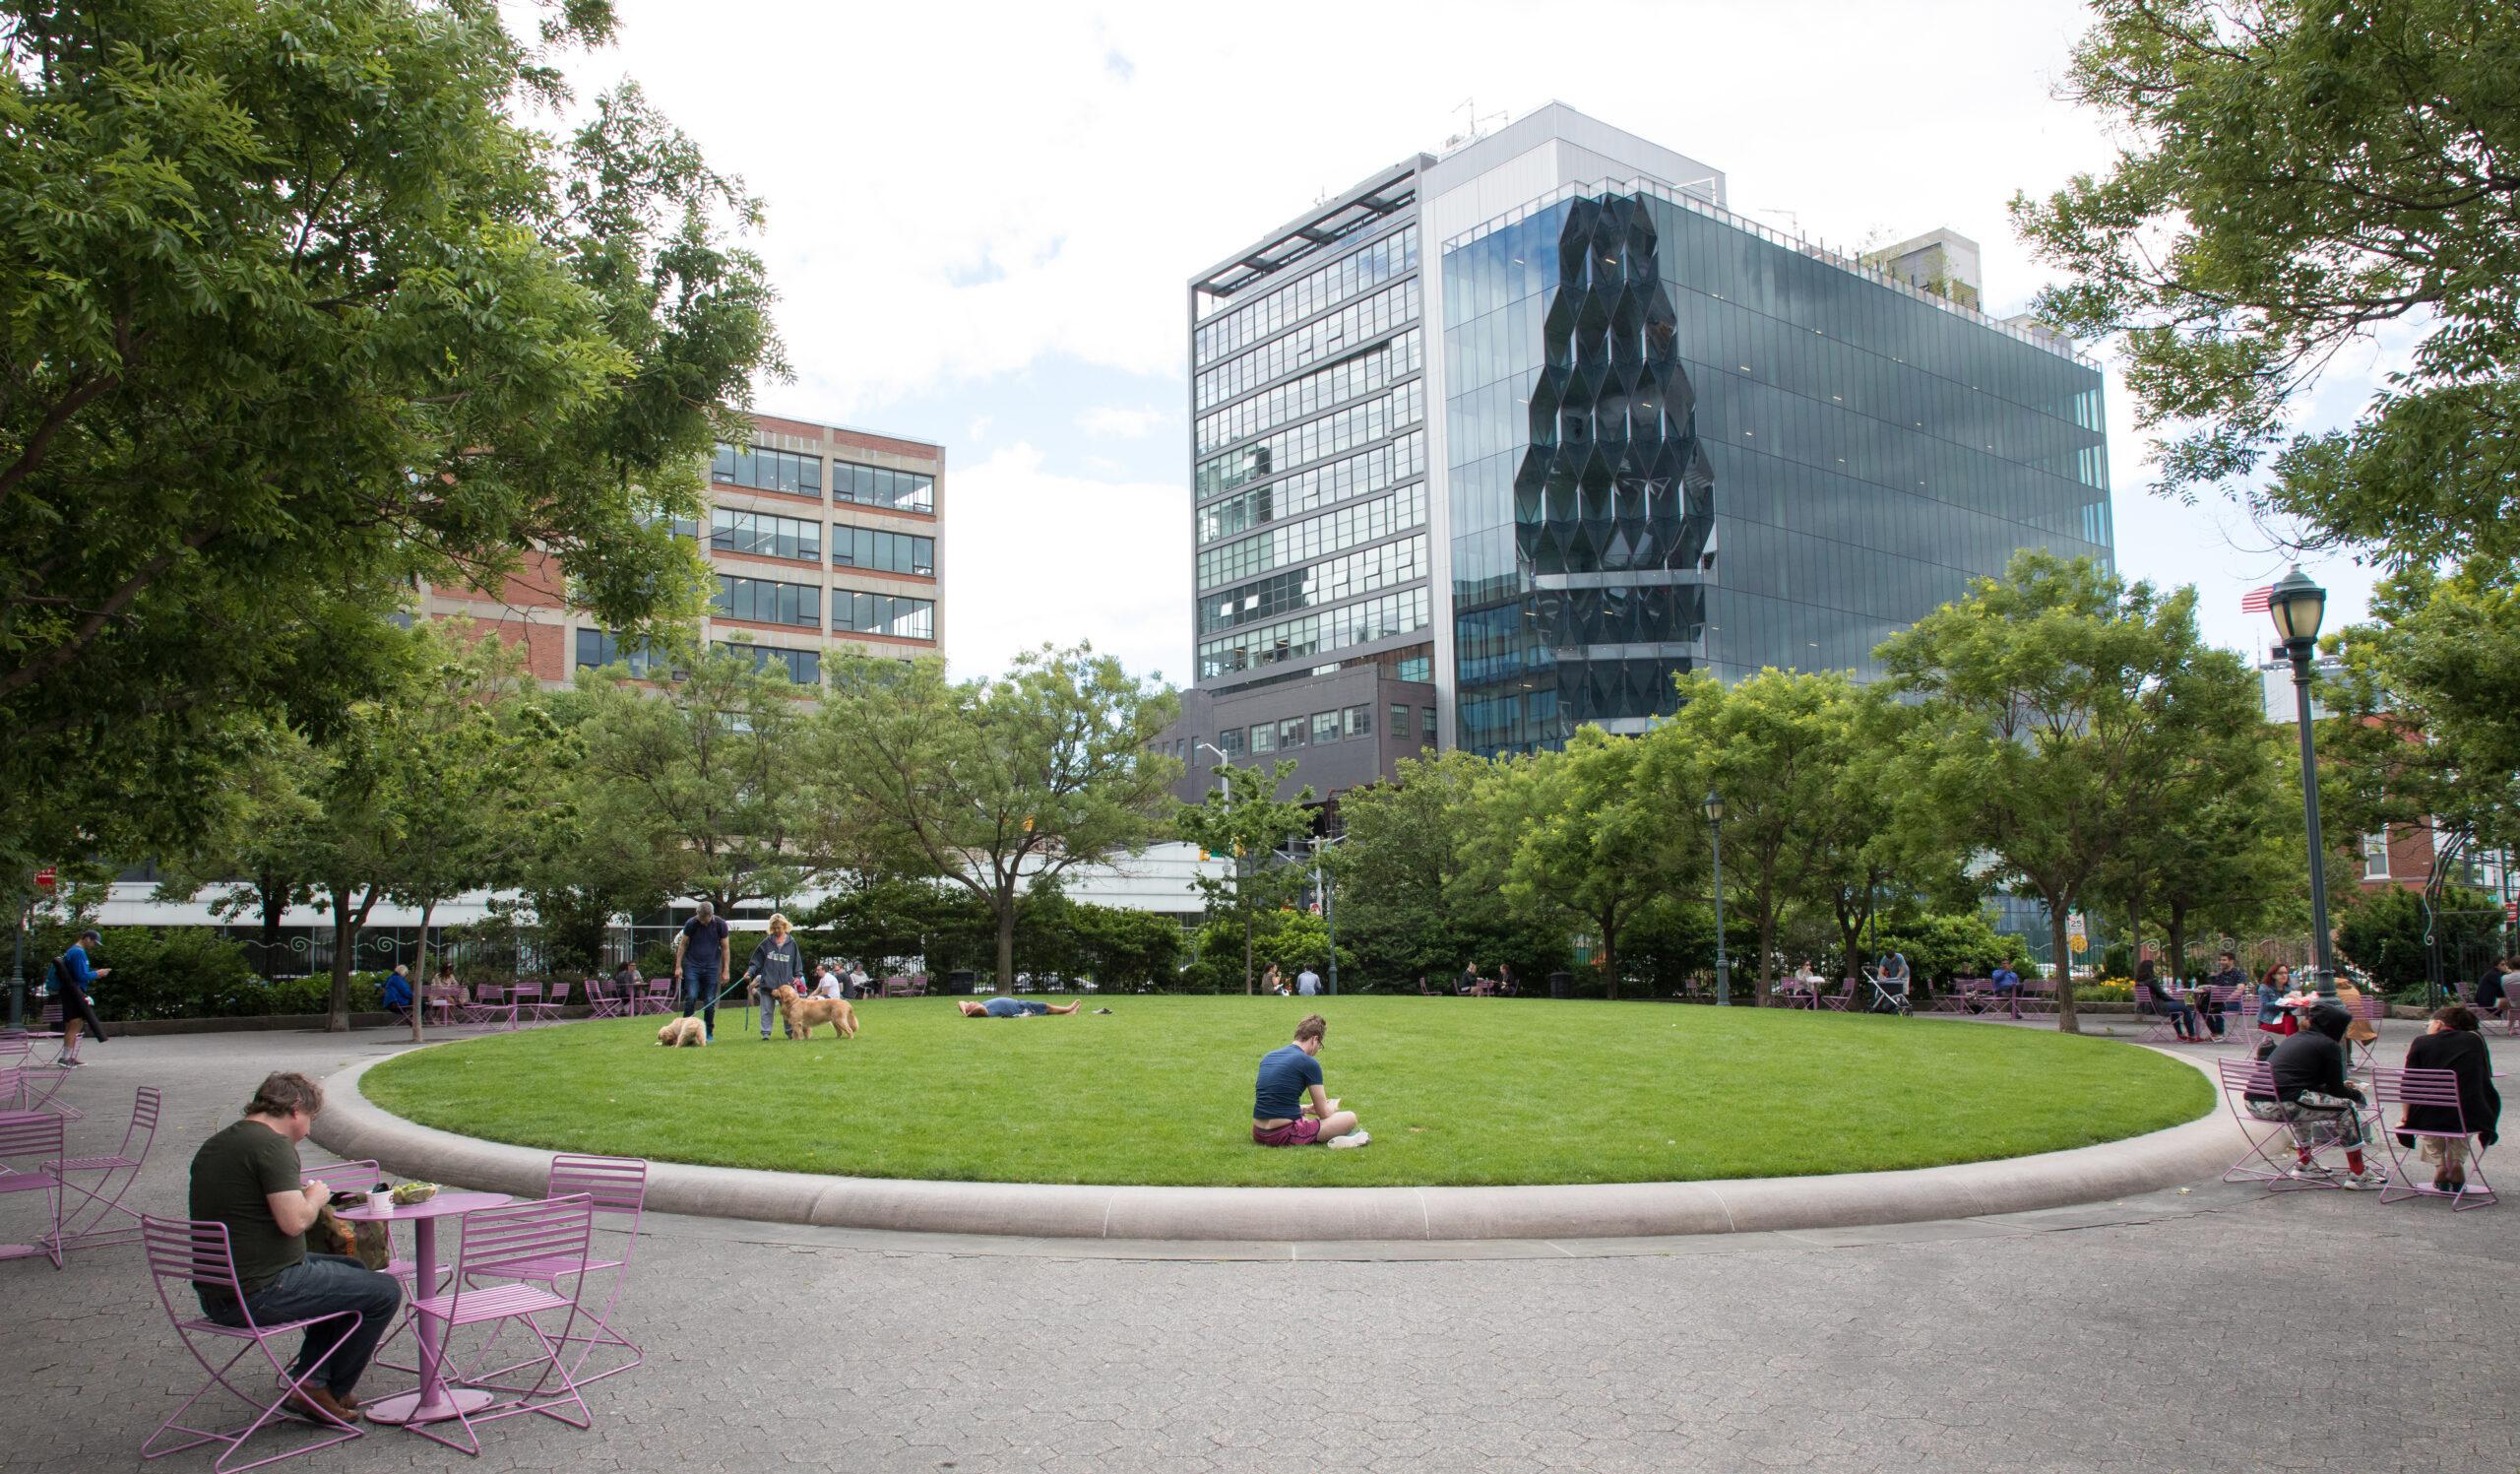 14th Street Park lawn circle